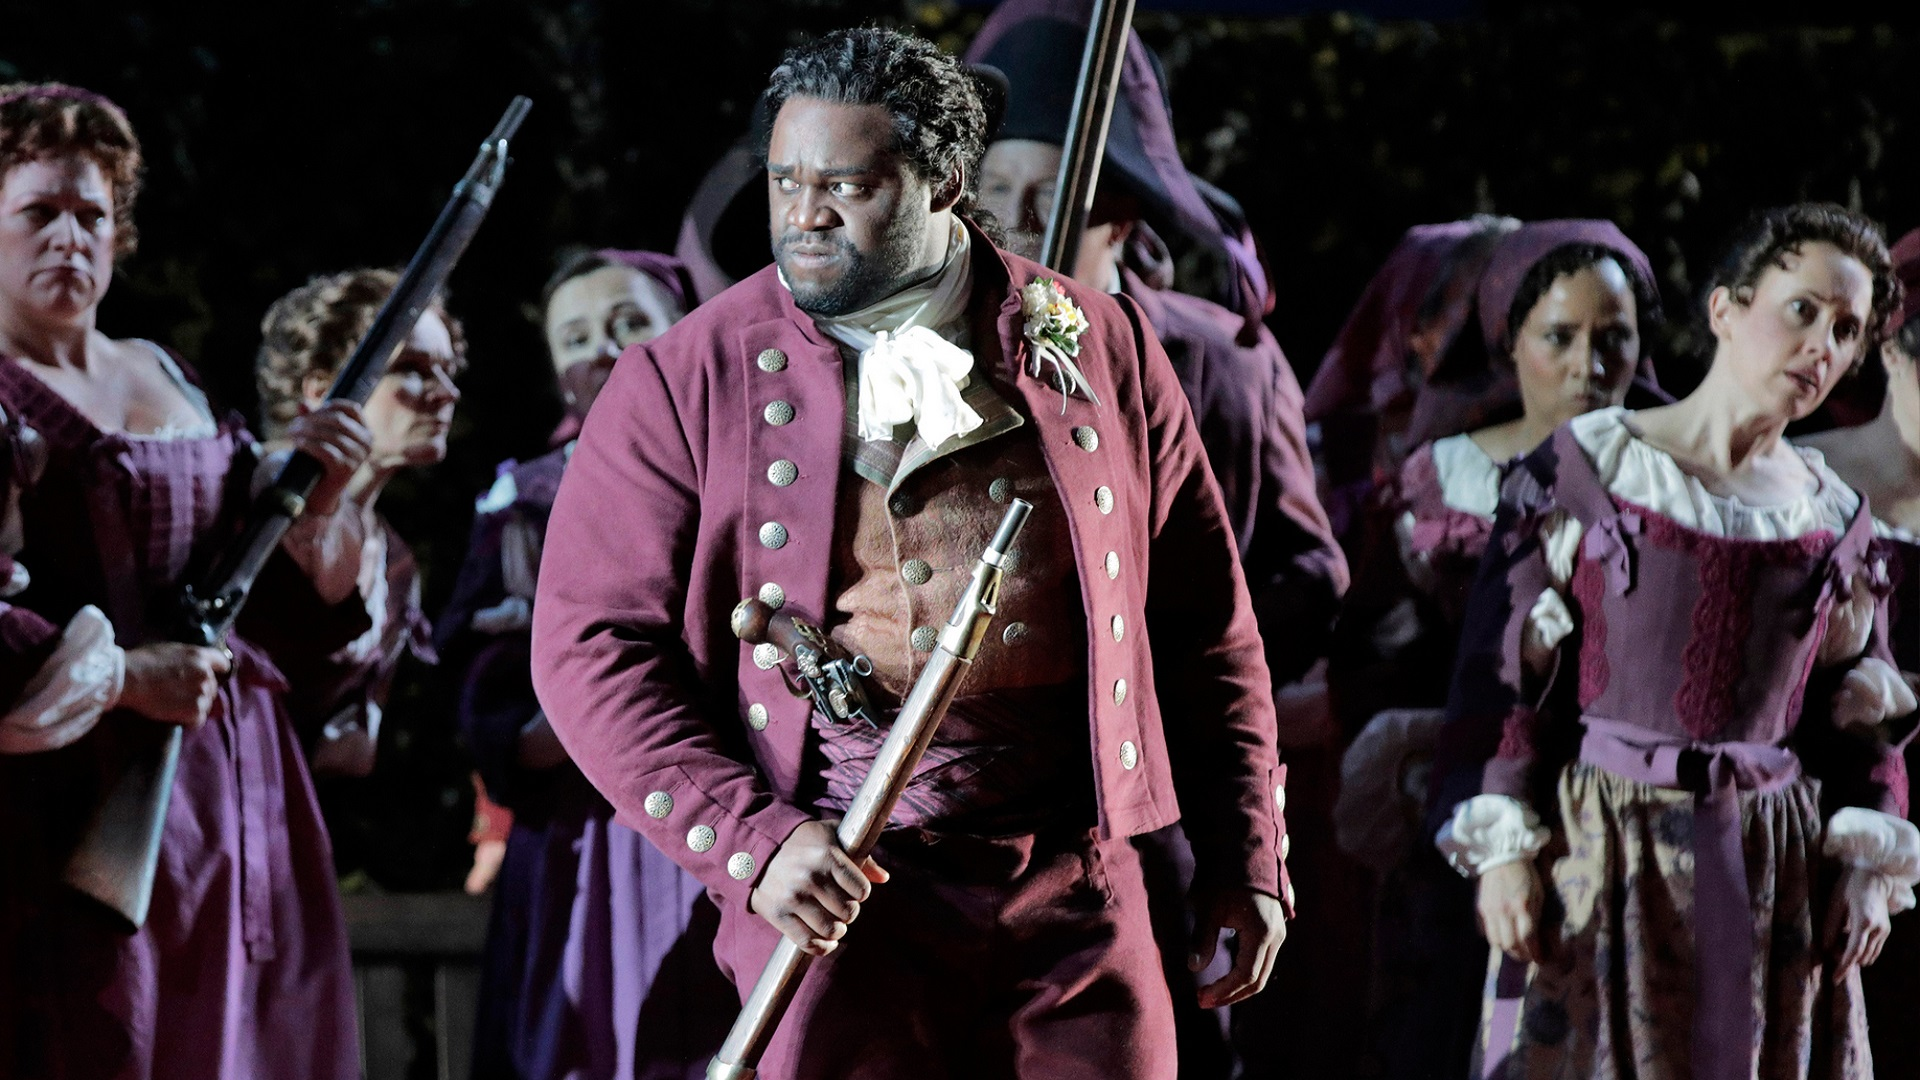 Opera-Director-Jacopo-Spirei-Don-Giovanni-Opera-by-Mozart-San-Francisco-2017-10